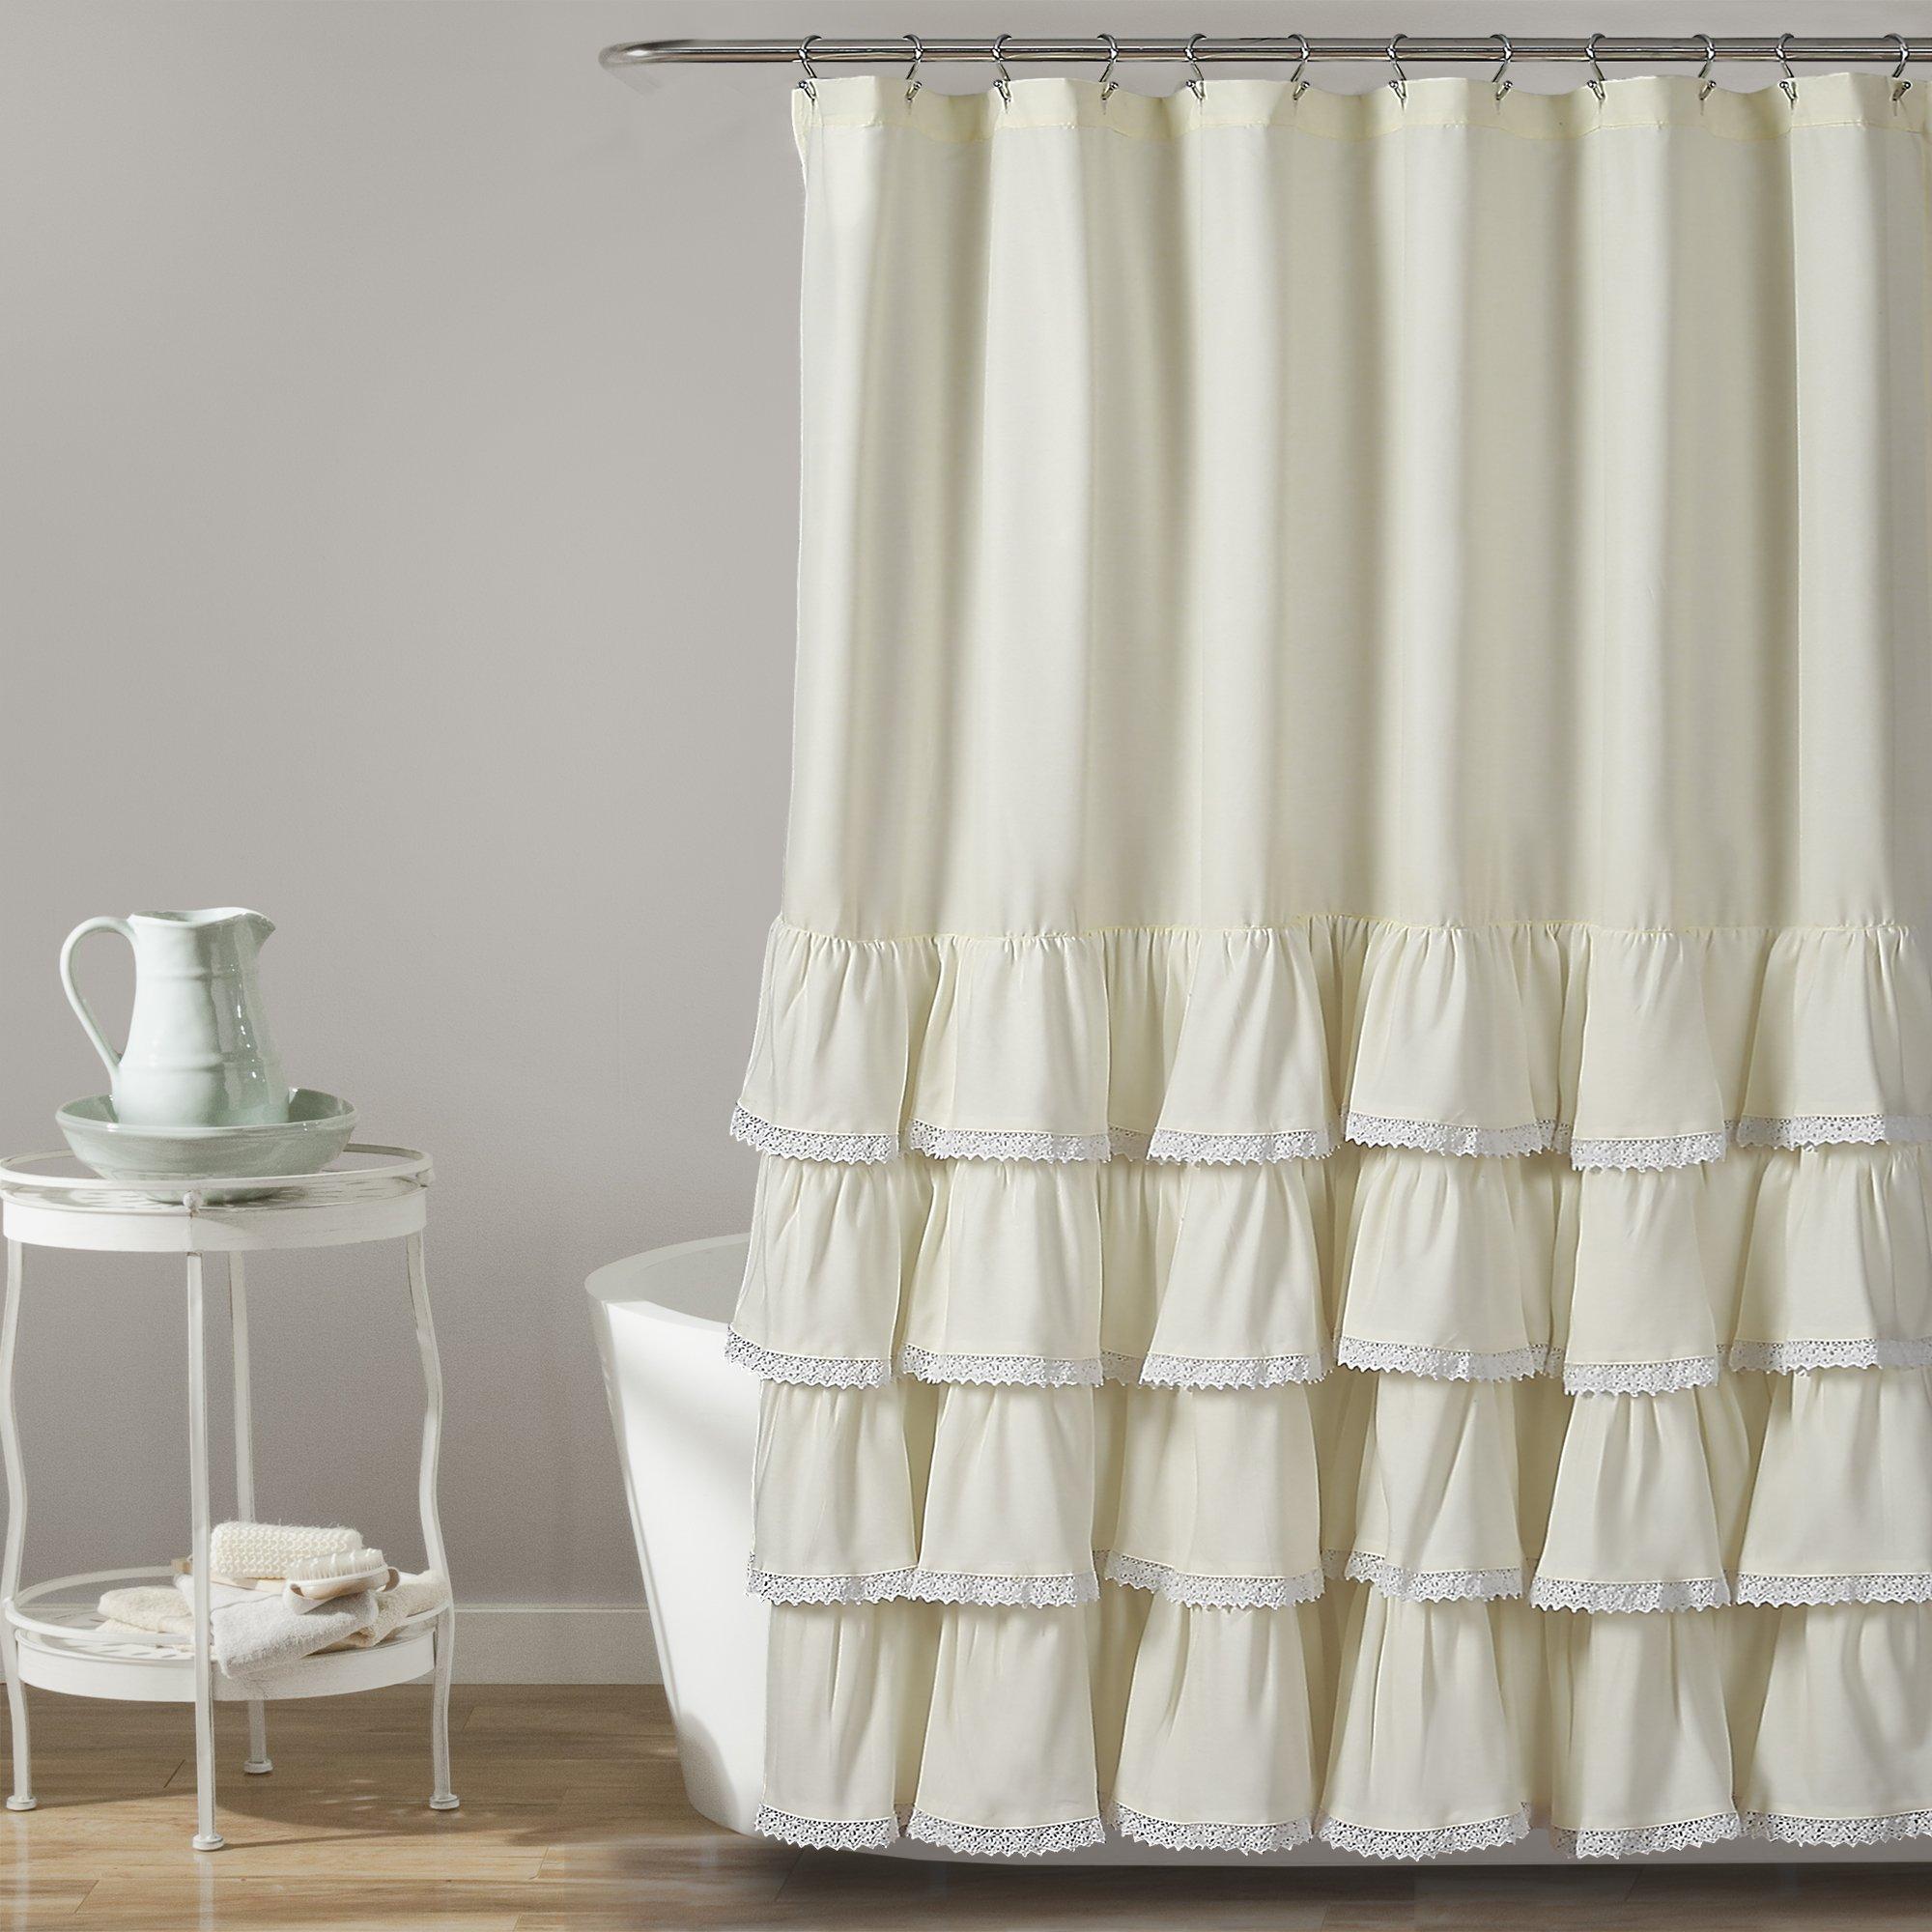 Lush Decor 16T002857 Ella Lace Ruffle Shower Curtain, 72'' x 72'', Ivory